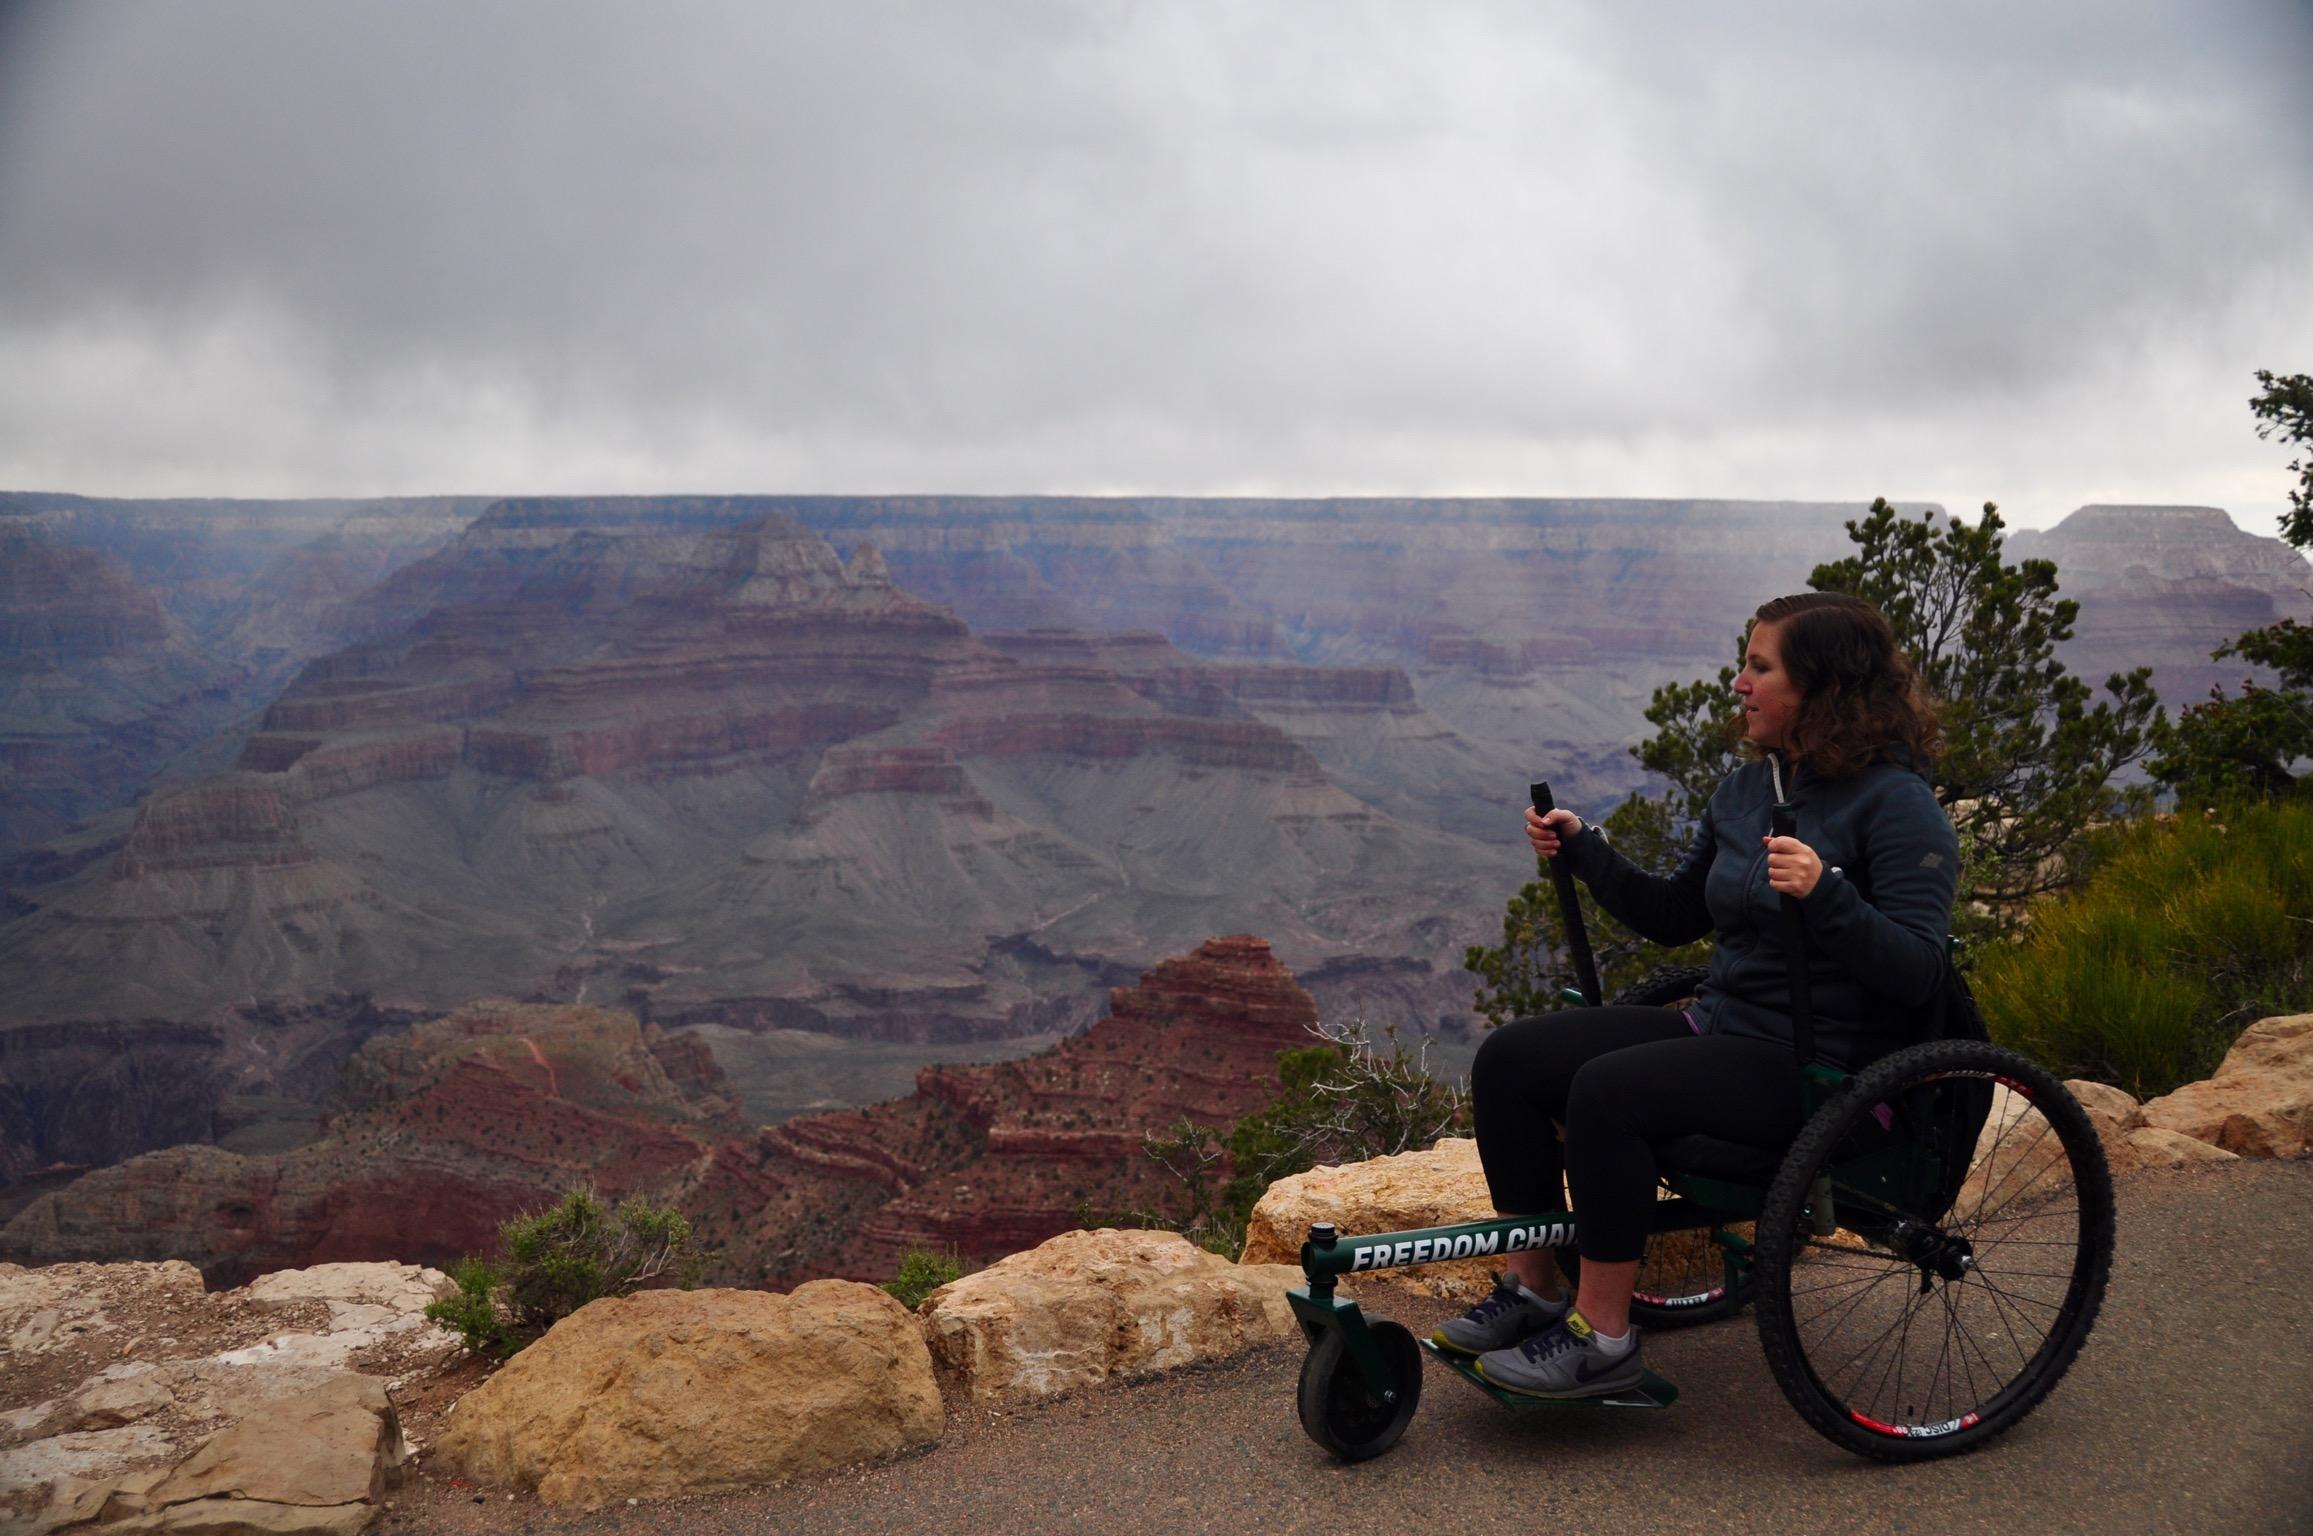 Soaking up the view at the Grand Canyon.